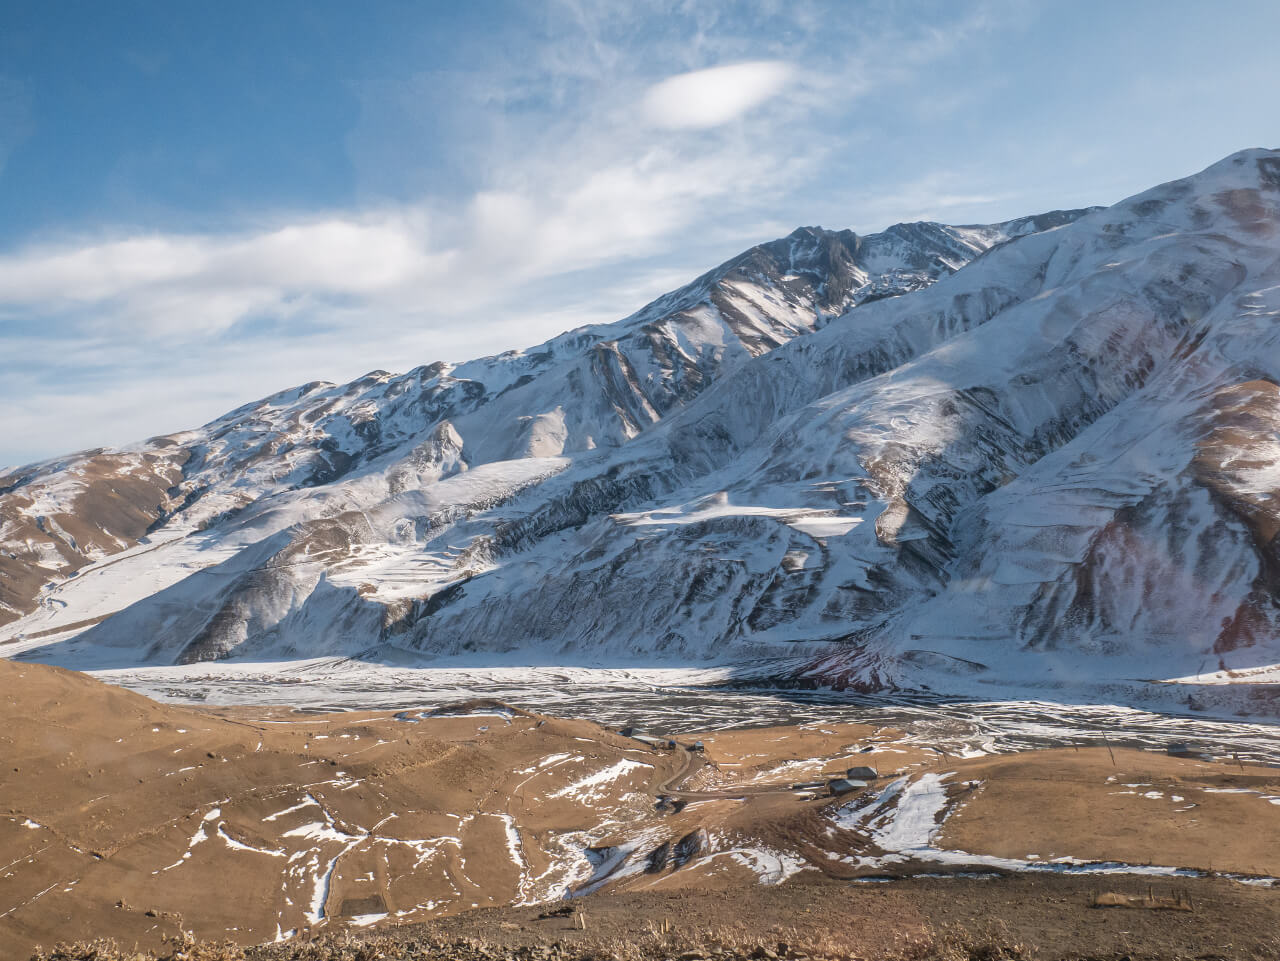 Widok na góry z Xinaliq